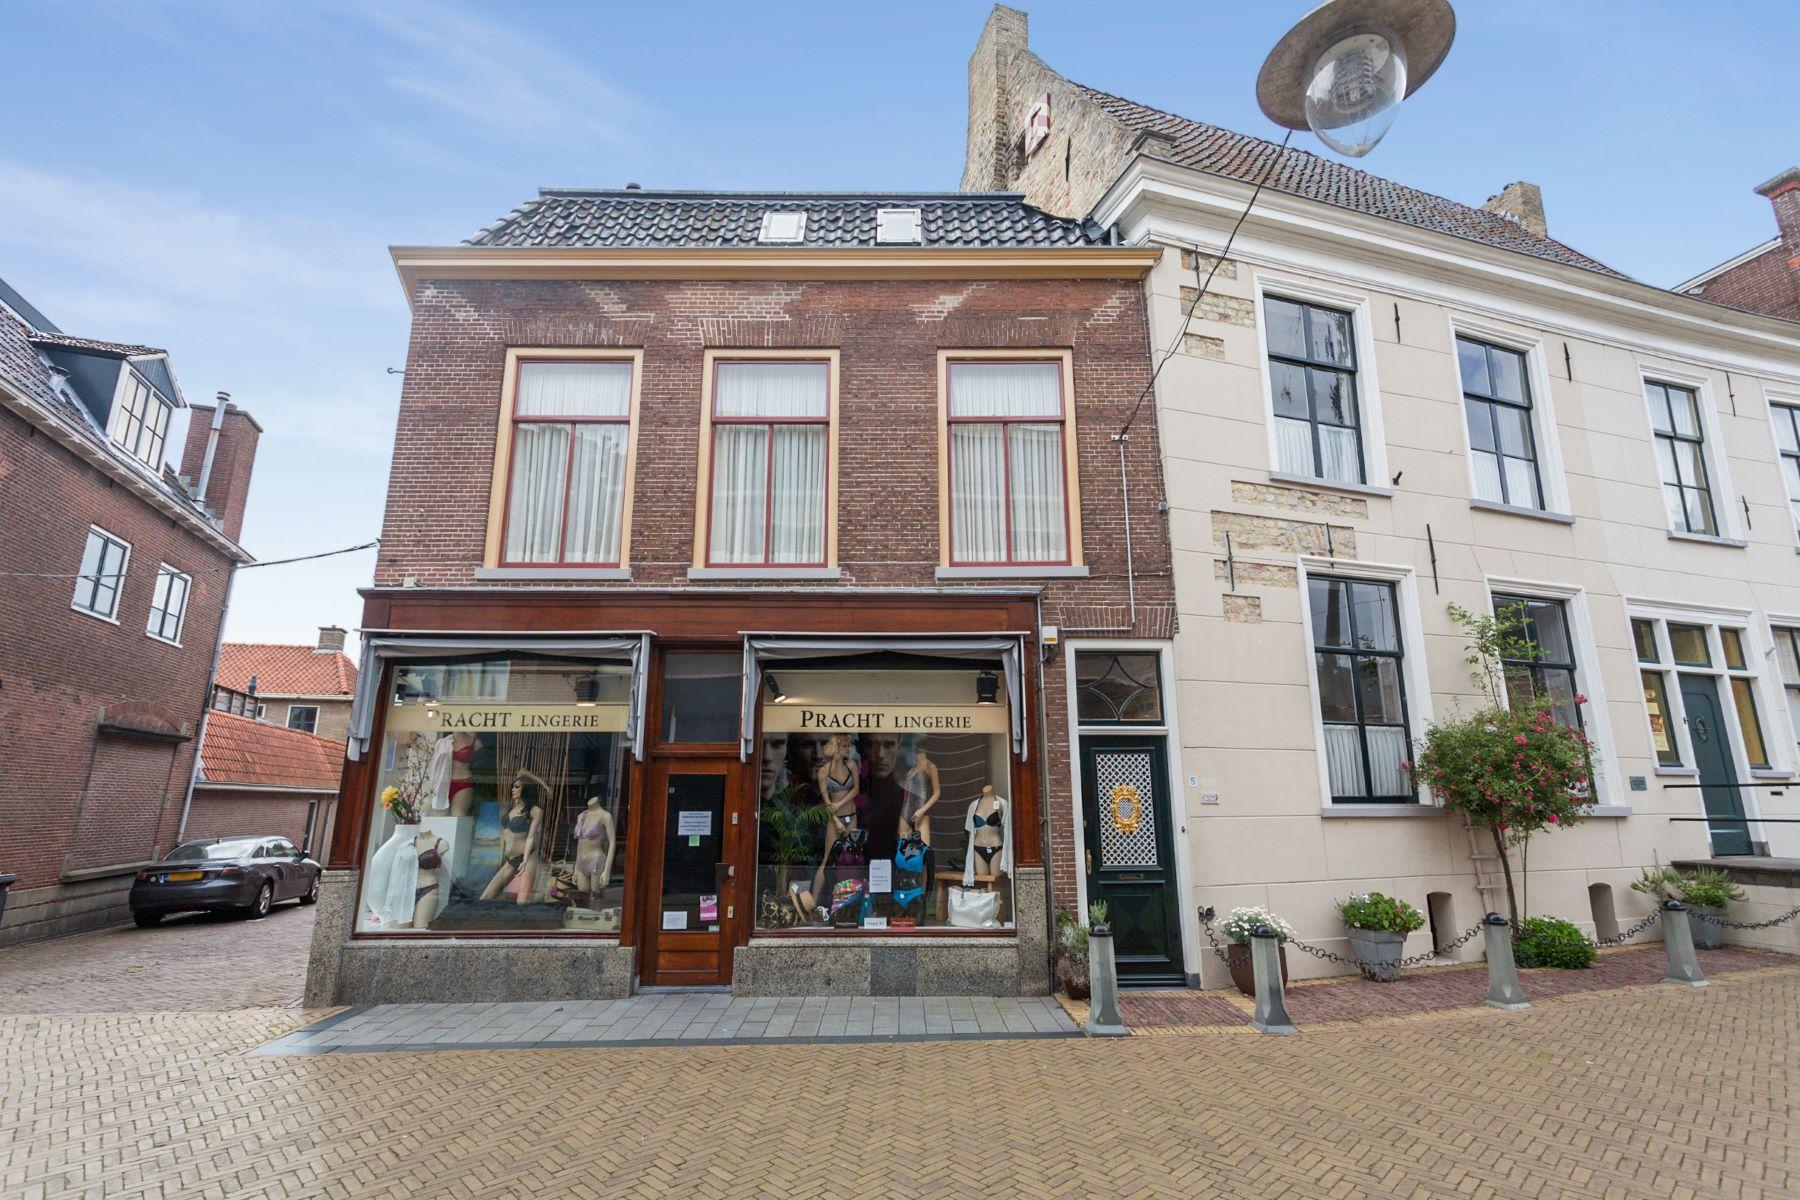 Casa Unifamiliar por un Venta en Monumental City-Residence Dijkstraat 5 Franeker, Friesland, 8801 LR Países Bajos